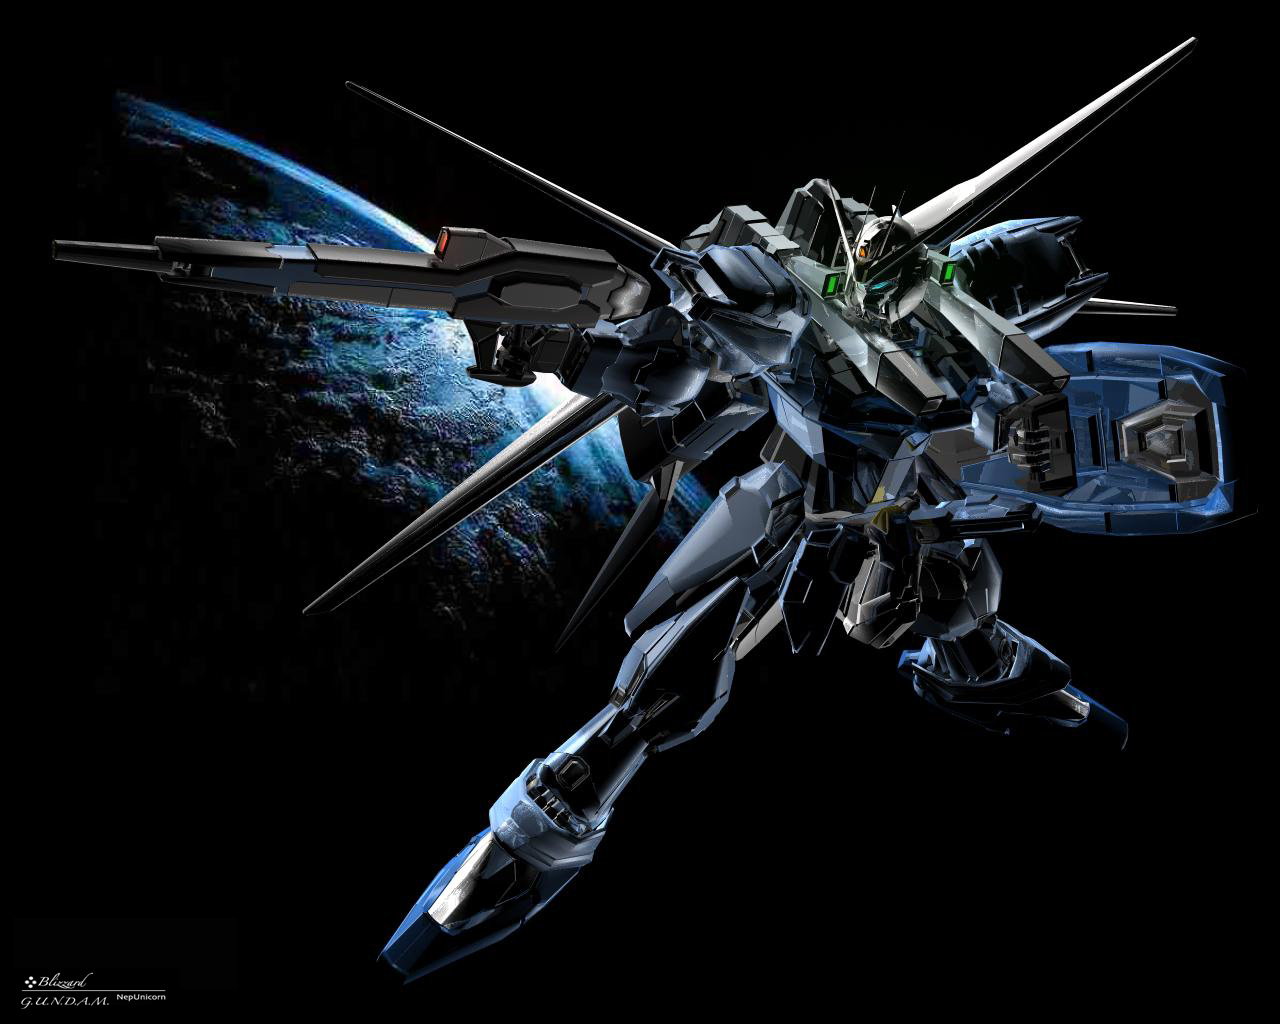 http://3.bp.blogspot.com/-2lhzmB5yuU0/UFIZesjUG9I/AAAAAAAAB4I/0EdZ_vMMtbo/s1600/Gundam+Wallpaper+(6).jpg